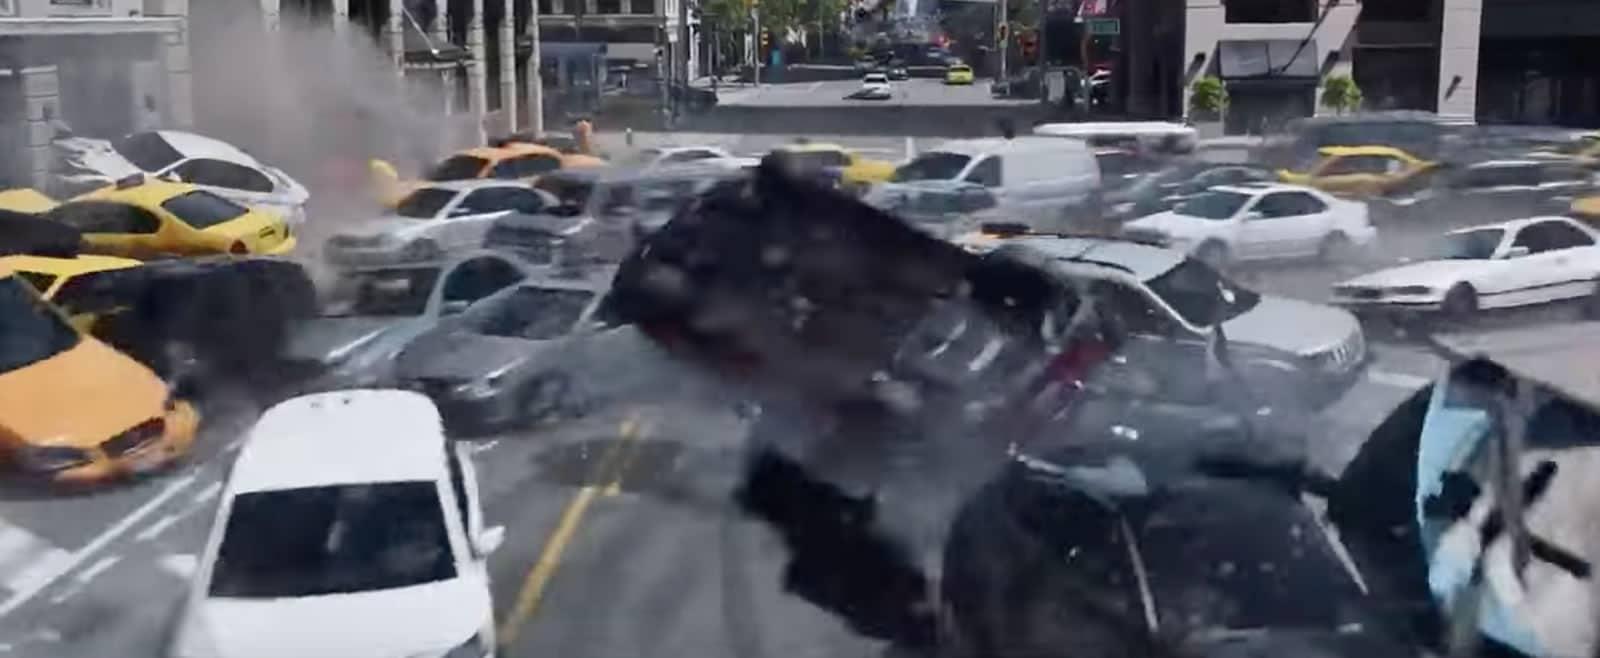 Parte del segundo trailer de The Fate of the Furious.